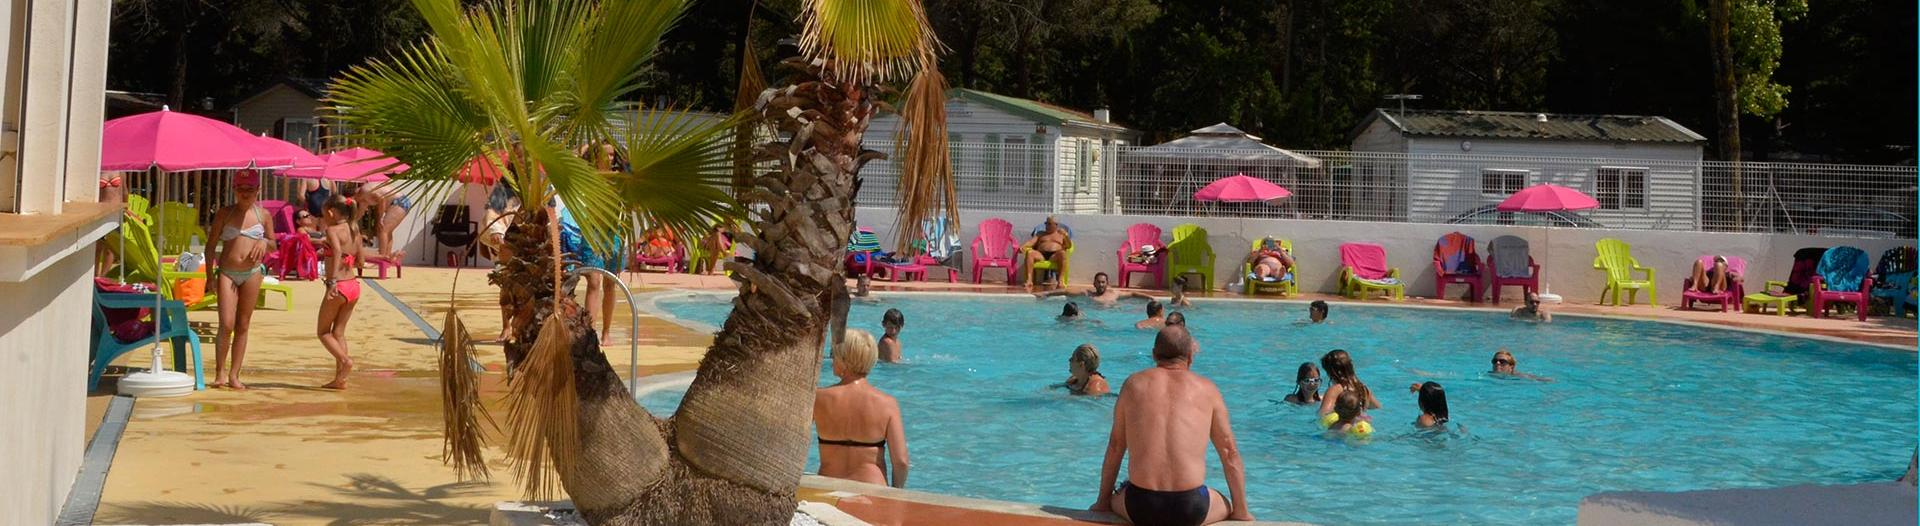 slider-camping-maiana-la-grande-motte-piscine-2019